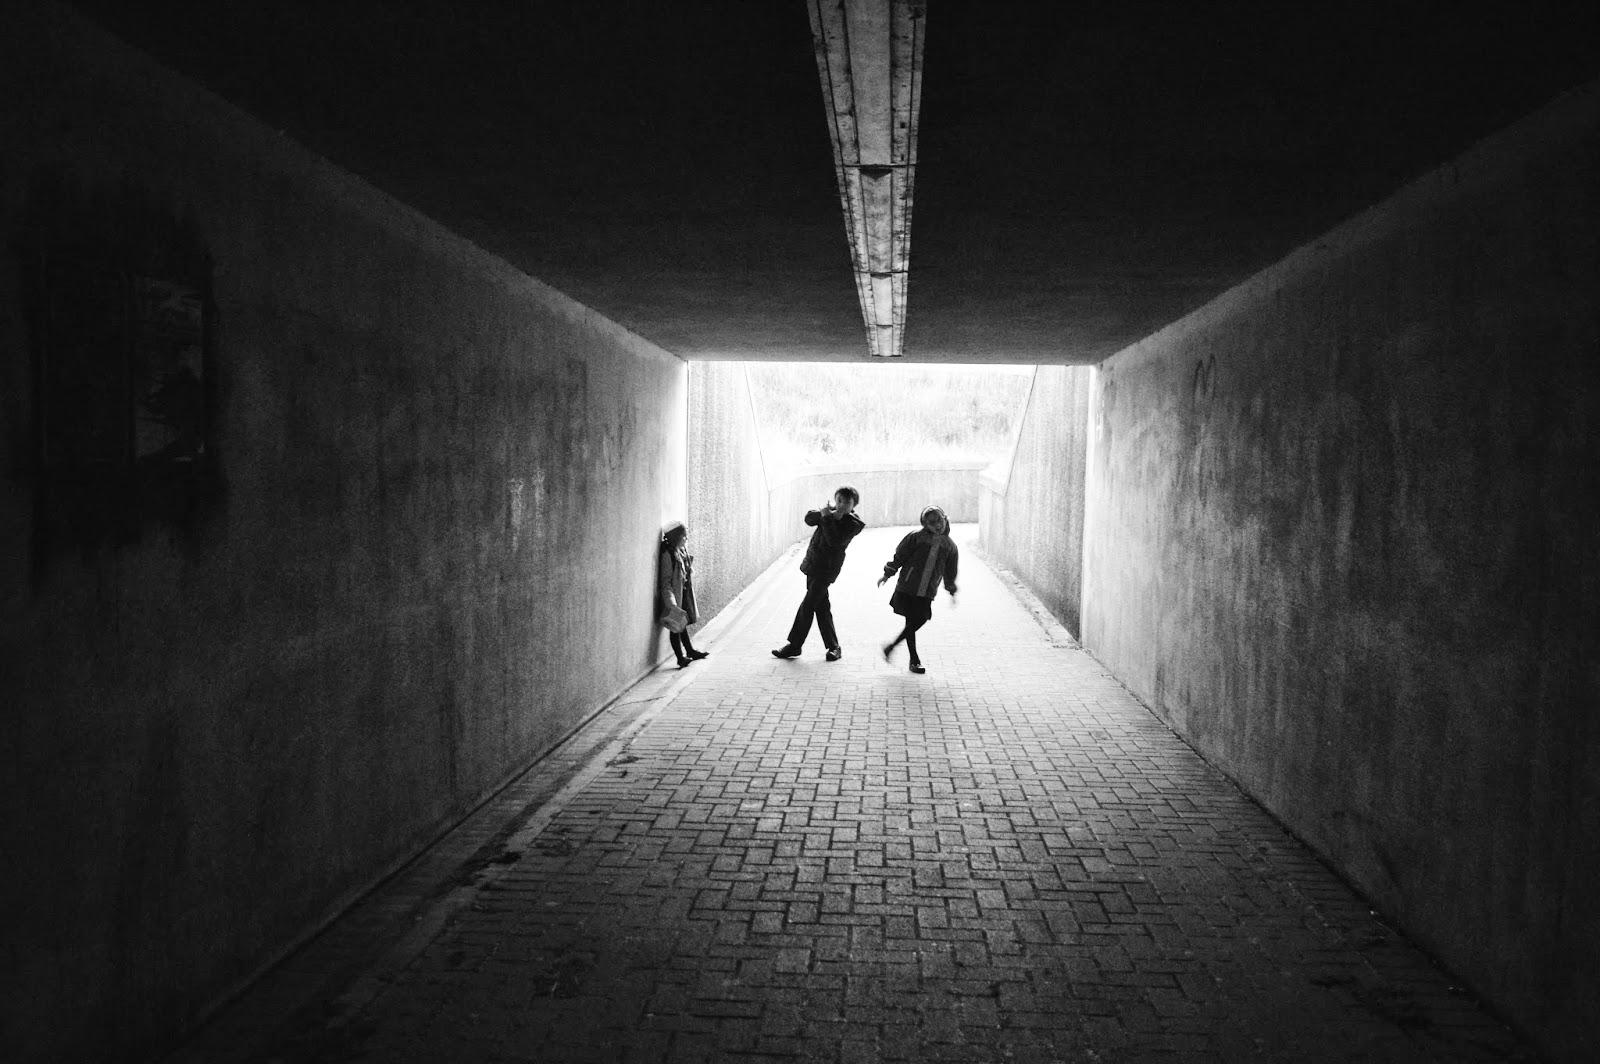 Kids silhouette photo monochrome tunnel light